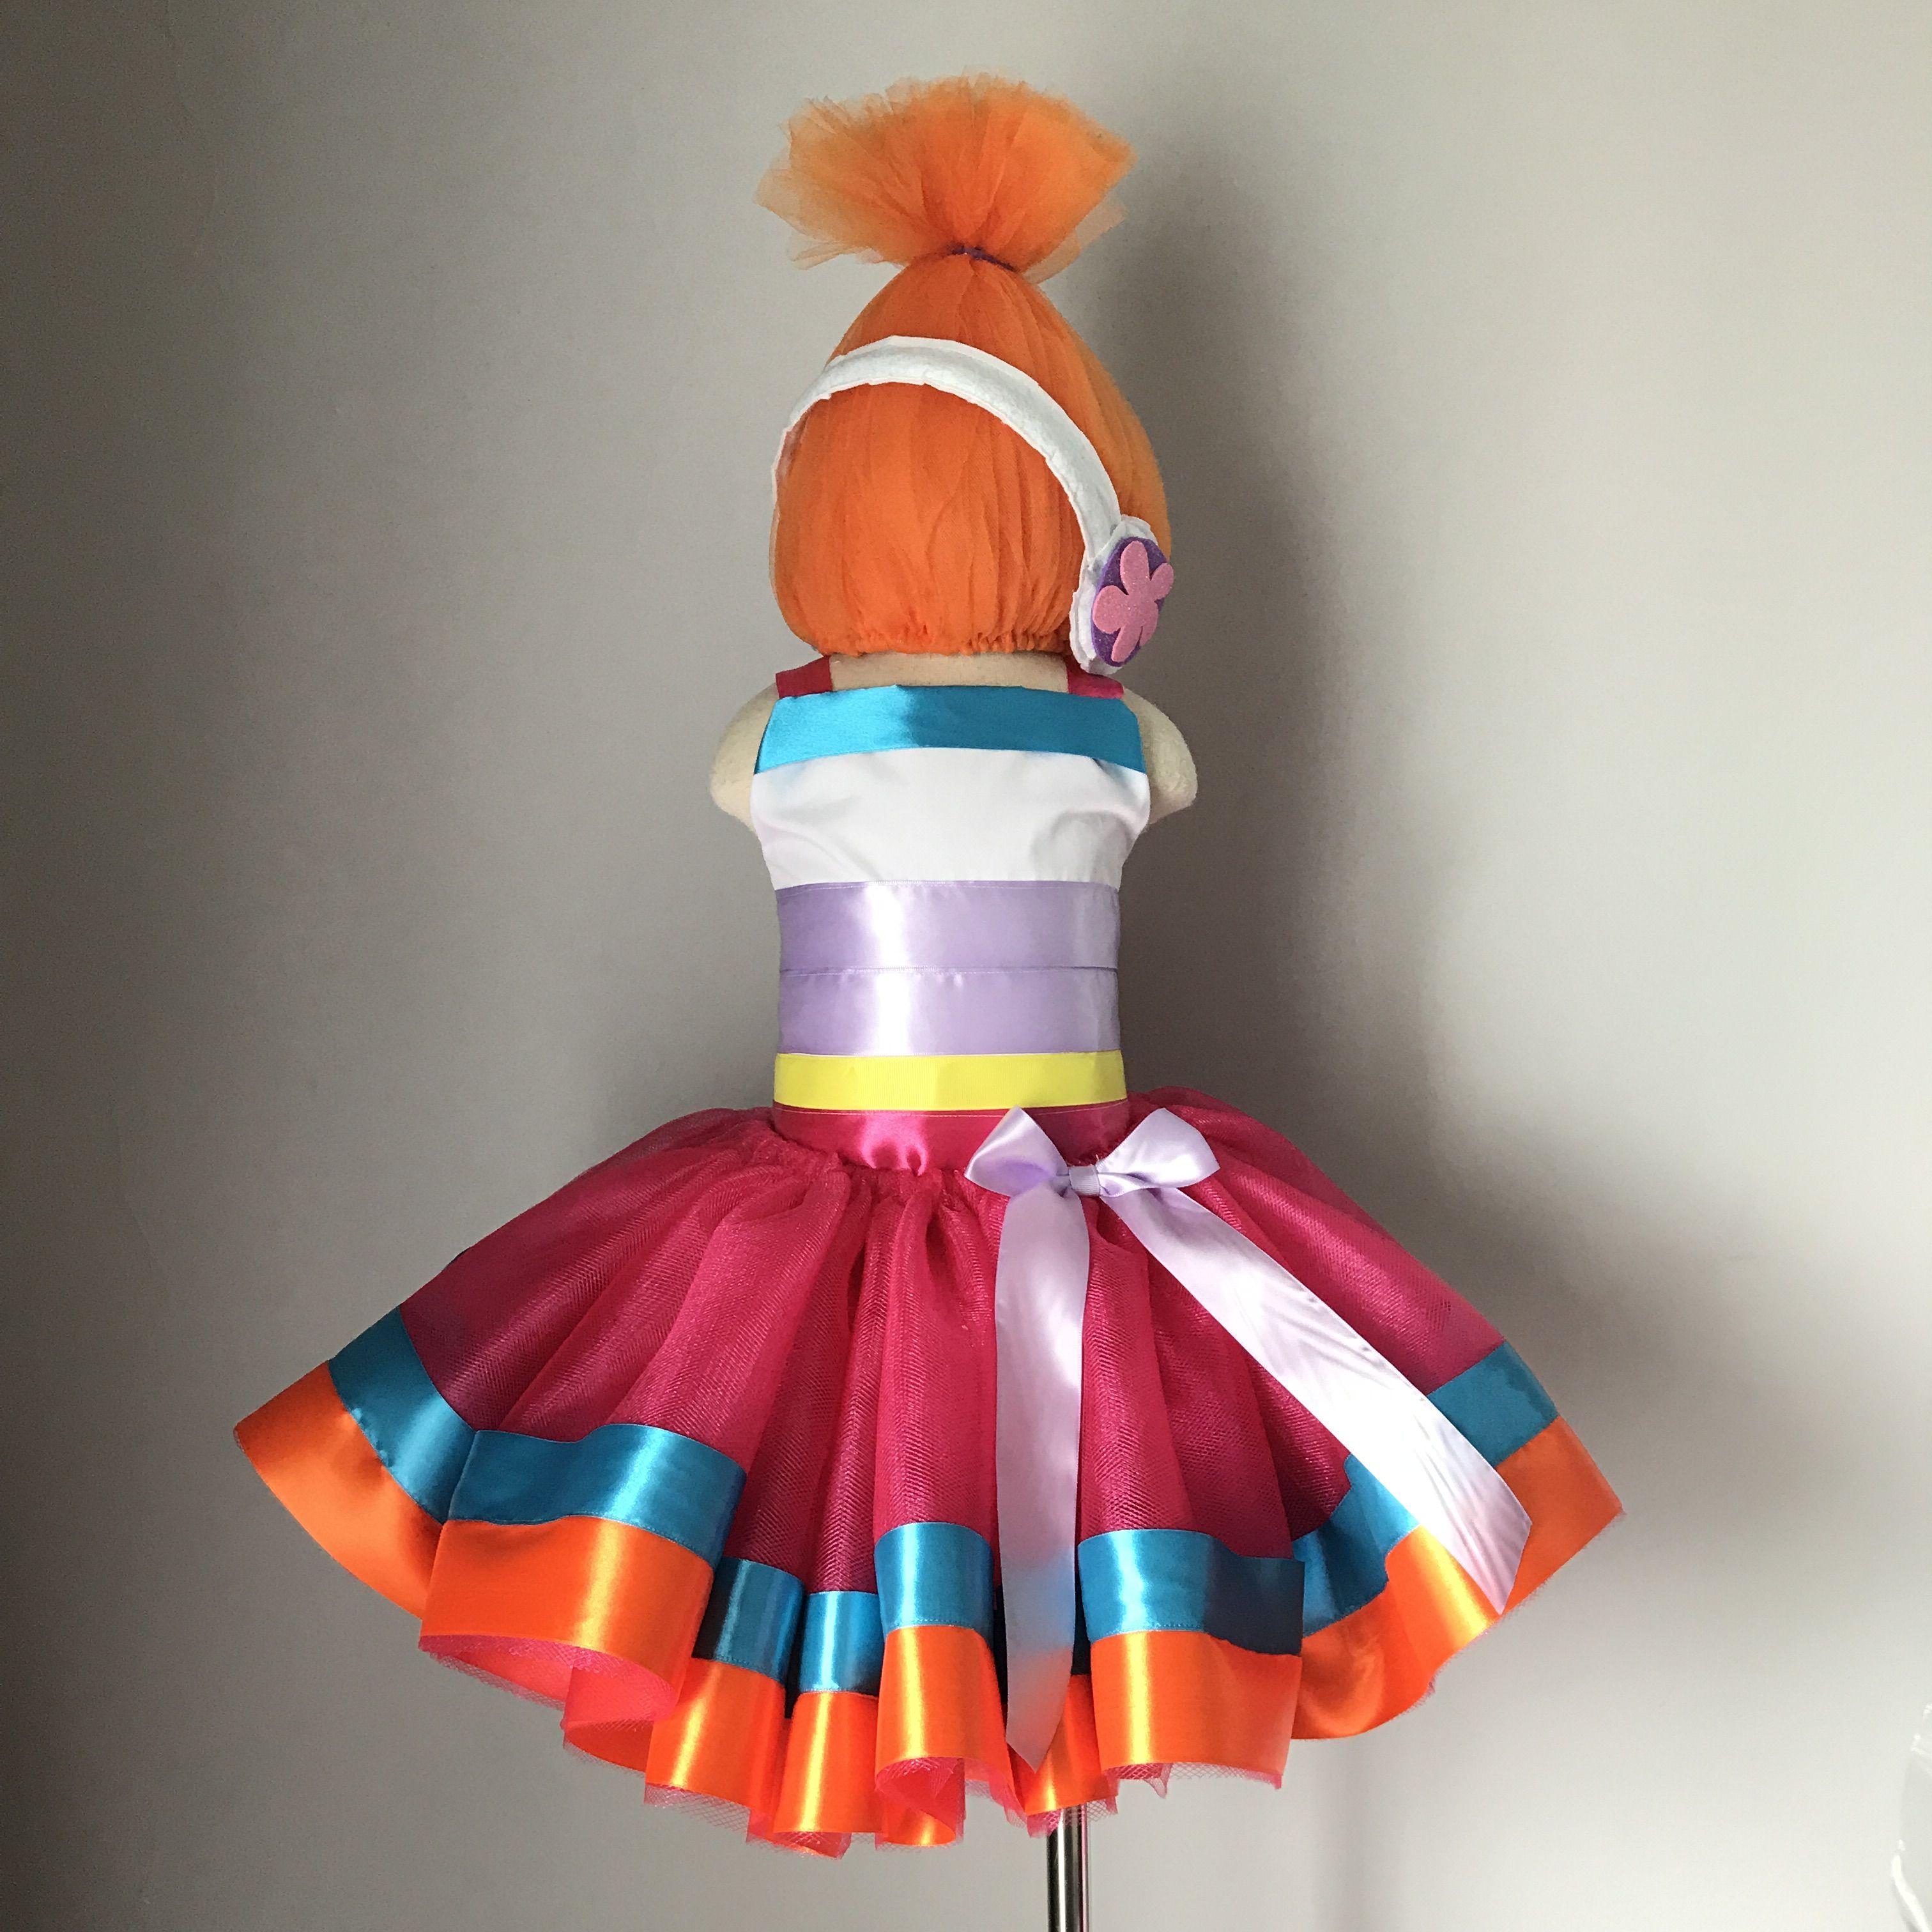 Trolls Garçons Costume Branch Fancy Dress Kids dreamworks sous Licence Enfants Costume